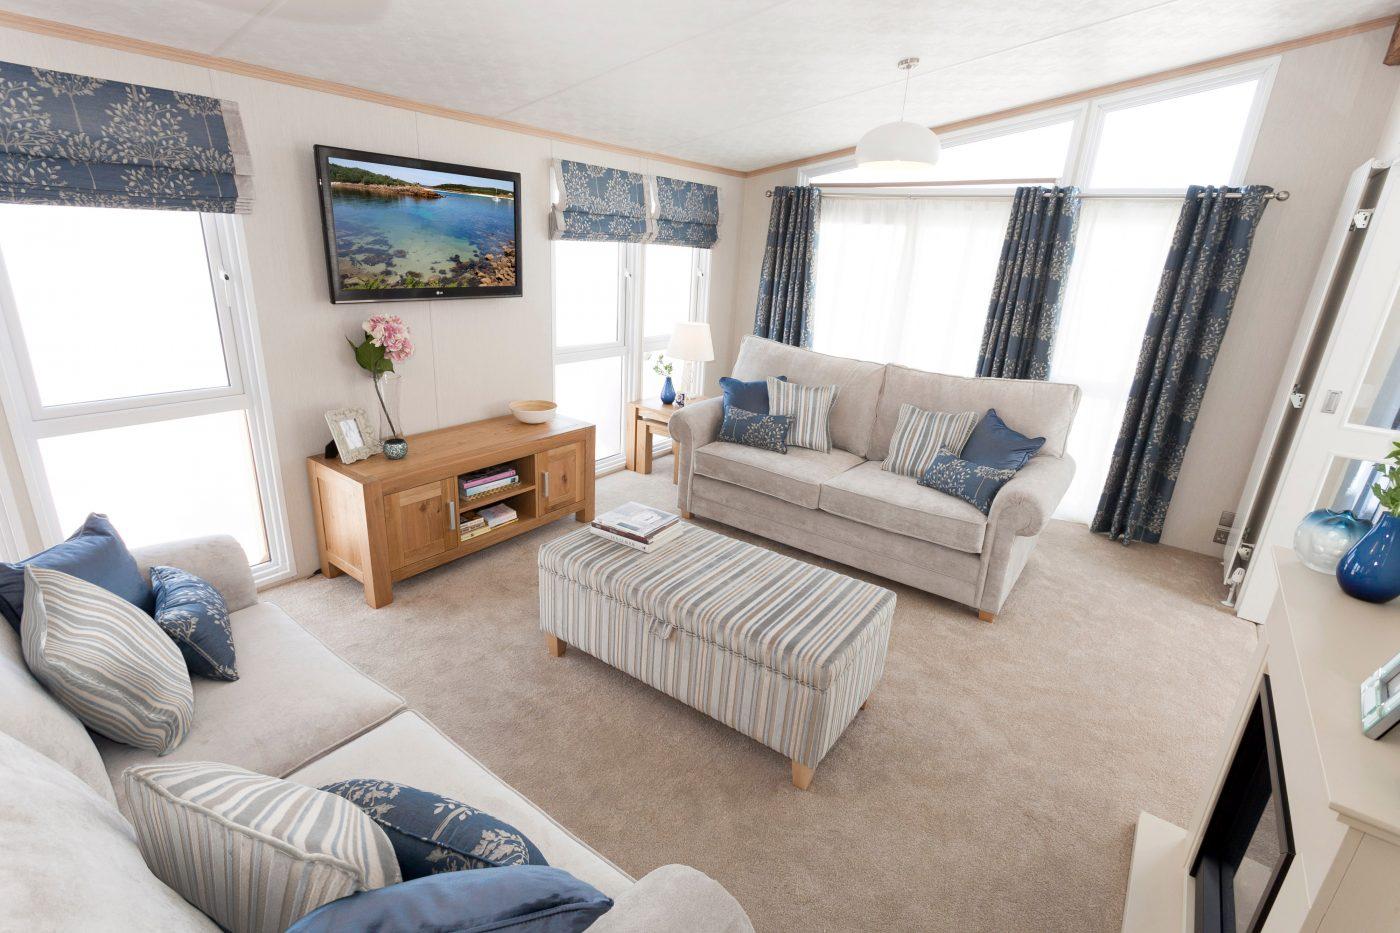 Pemberton rivendale 2015 smyth leisure mobile homessmyth for Pemberton cabins